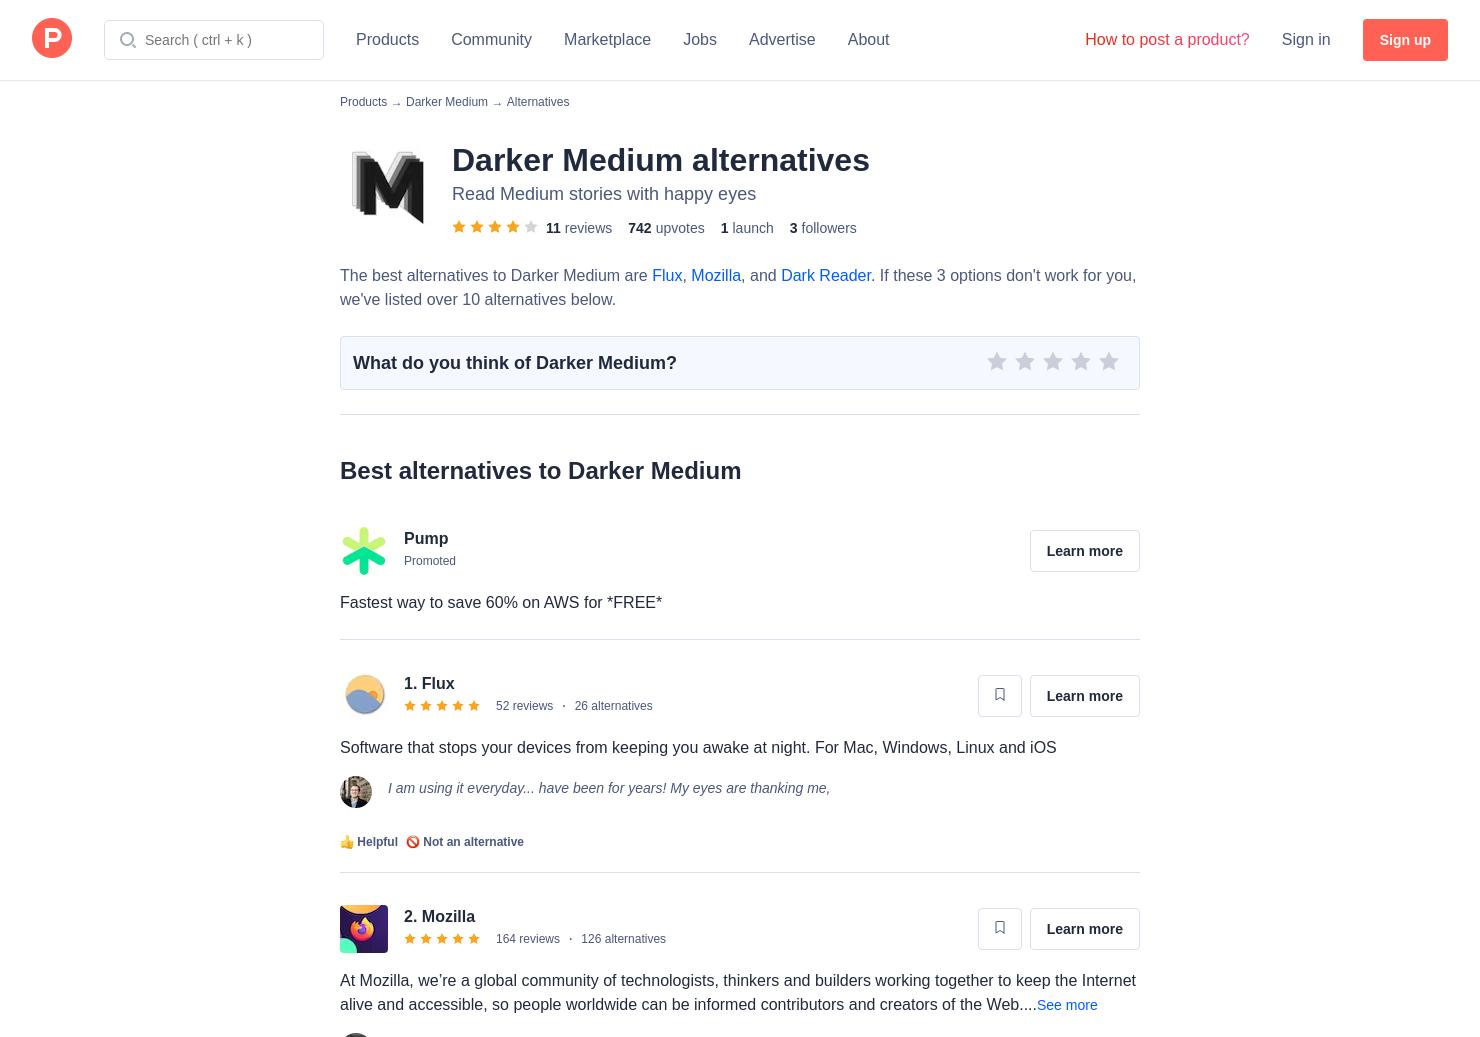 22 Alternatives to Darker Medium for Chrome Extensions